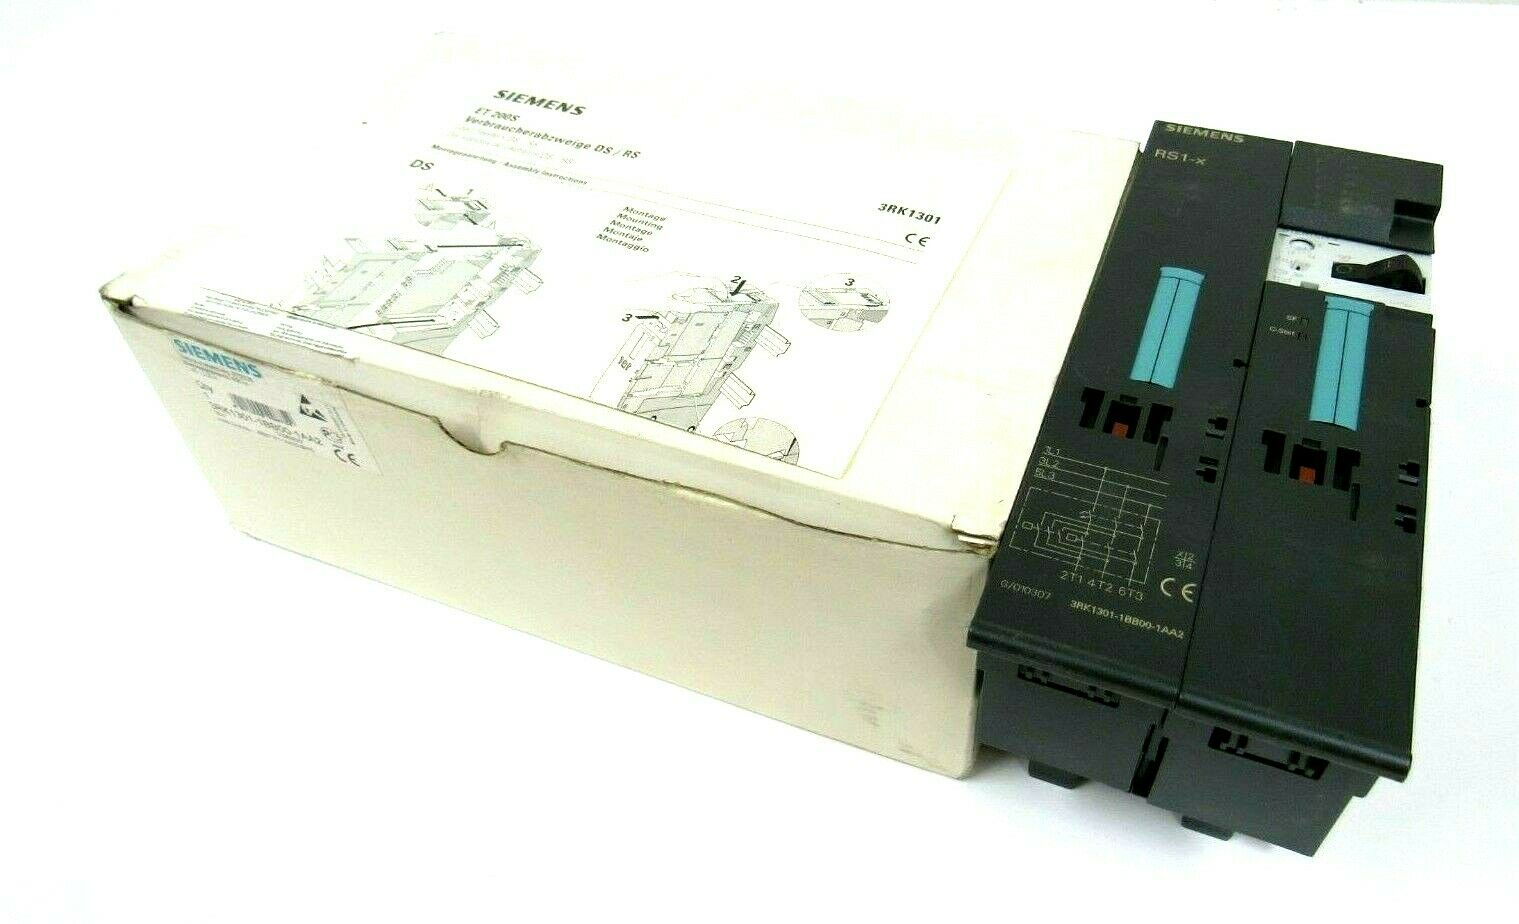 ONE NEW SIEMENS motor starter 3RK1301-1EB00-1AA2